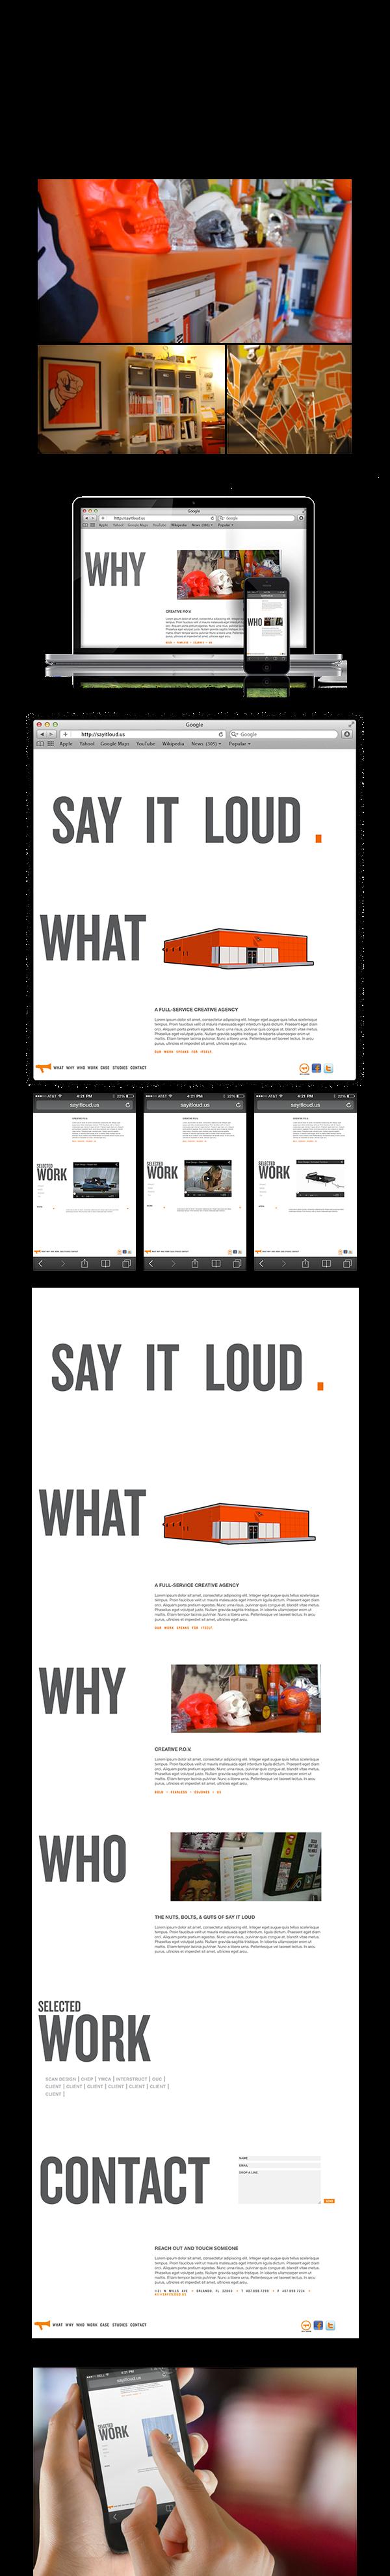 say it loud agency creative activist orange Proposal